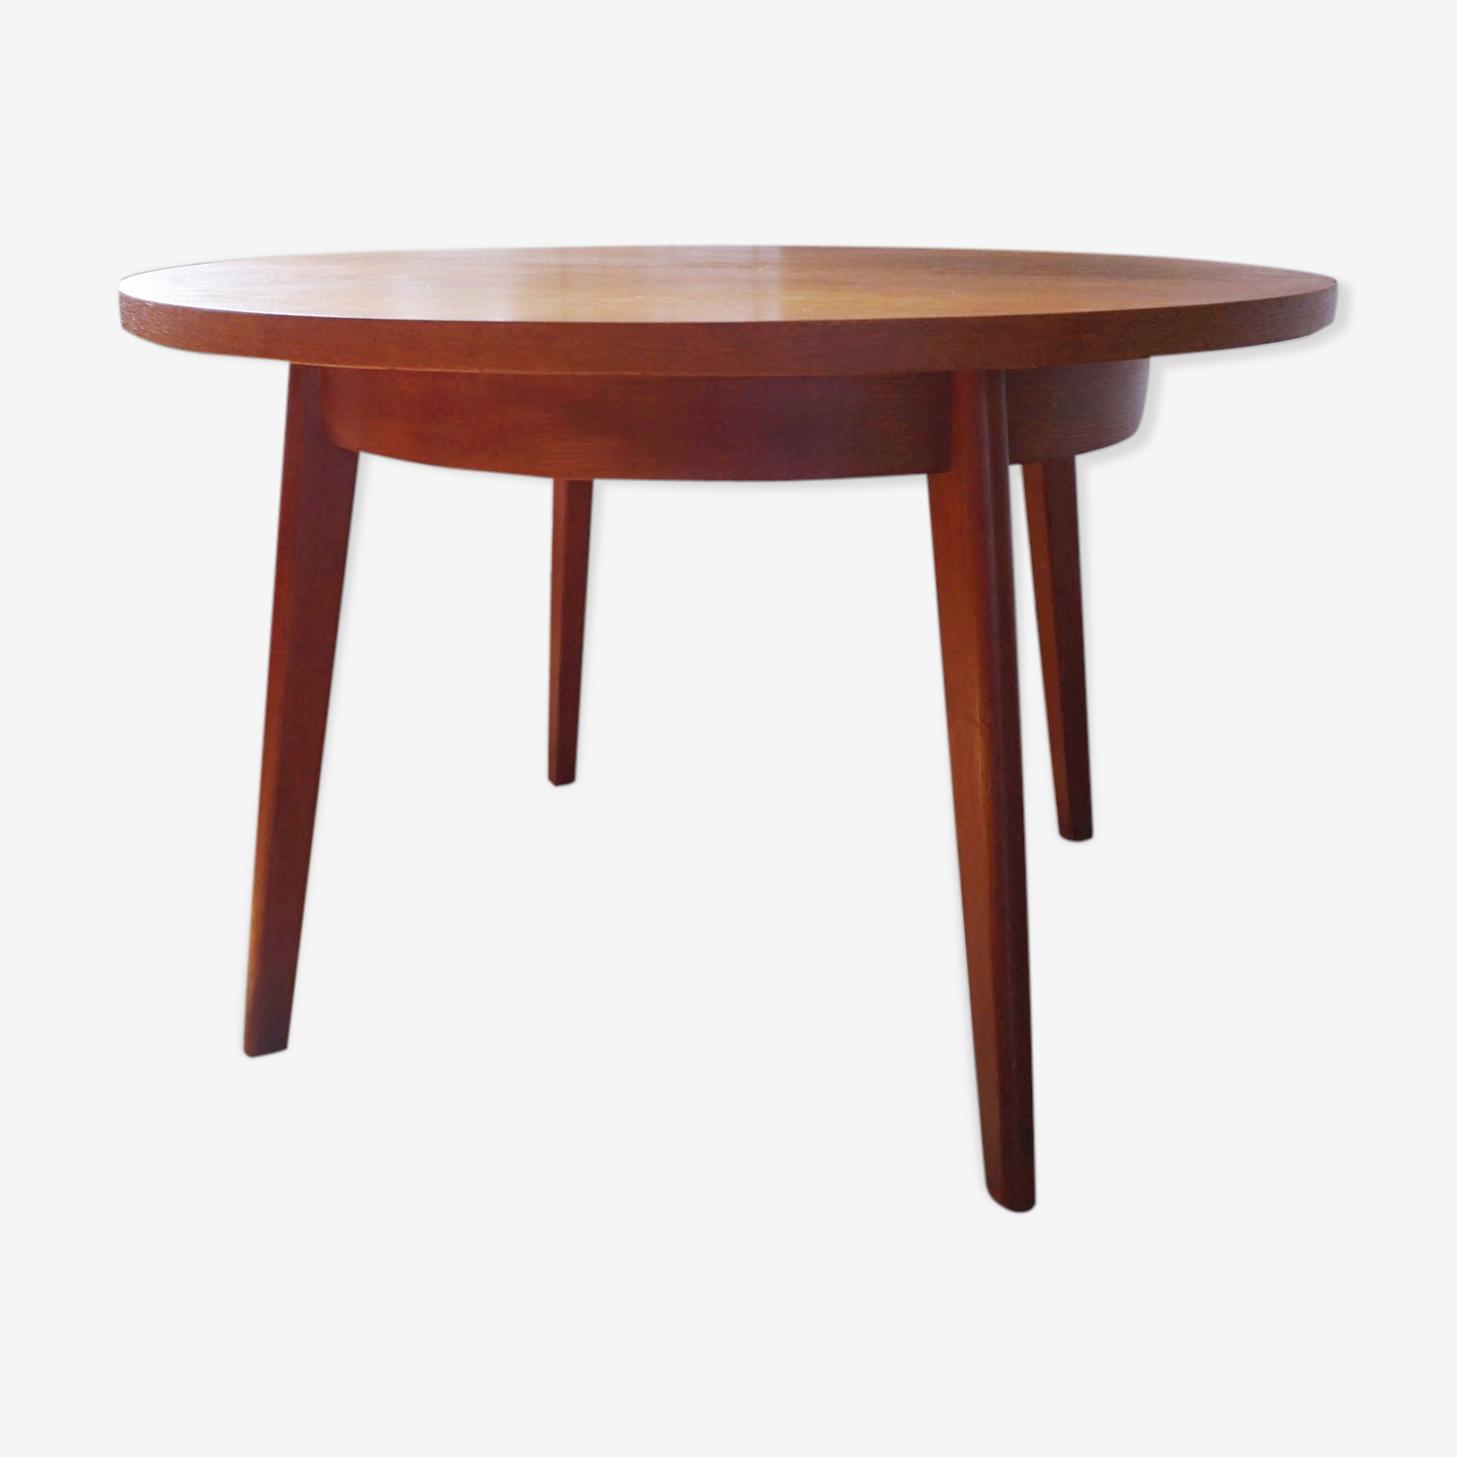 Scandinavian table with Pastoe teak extension